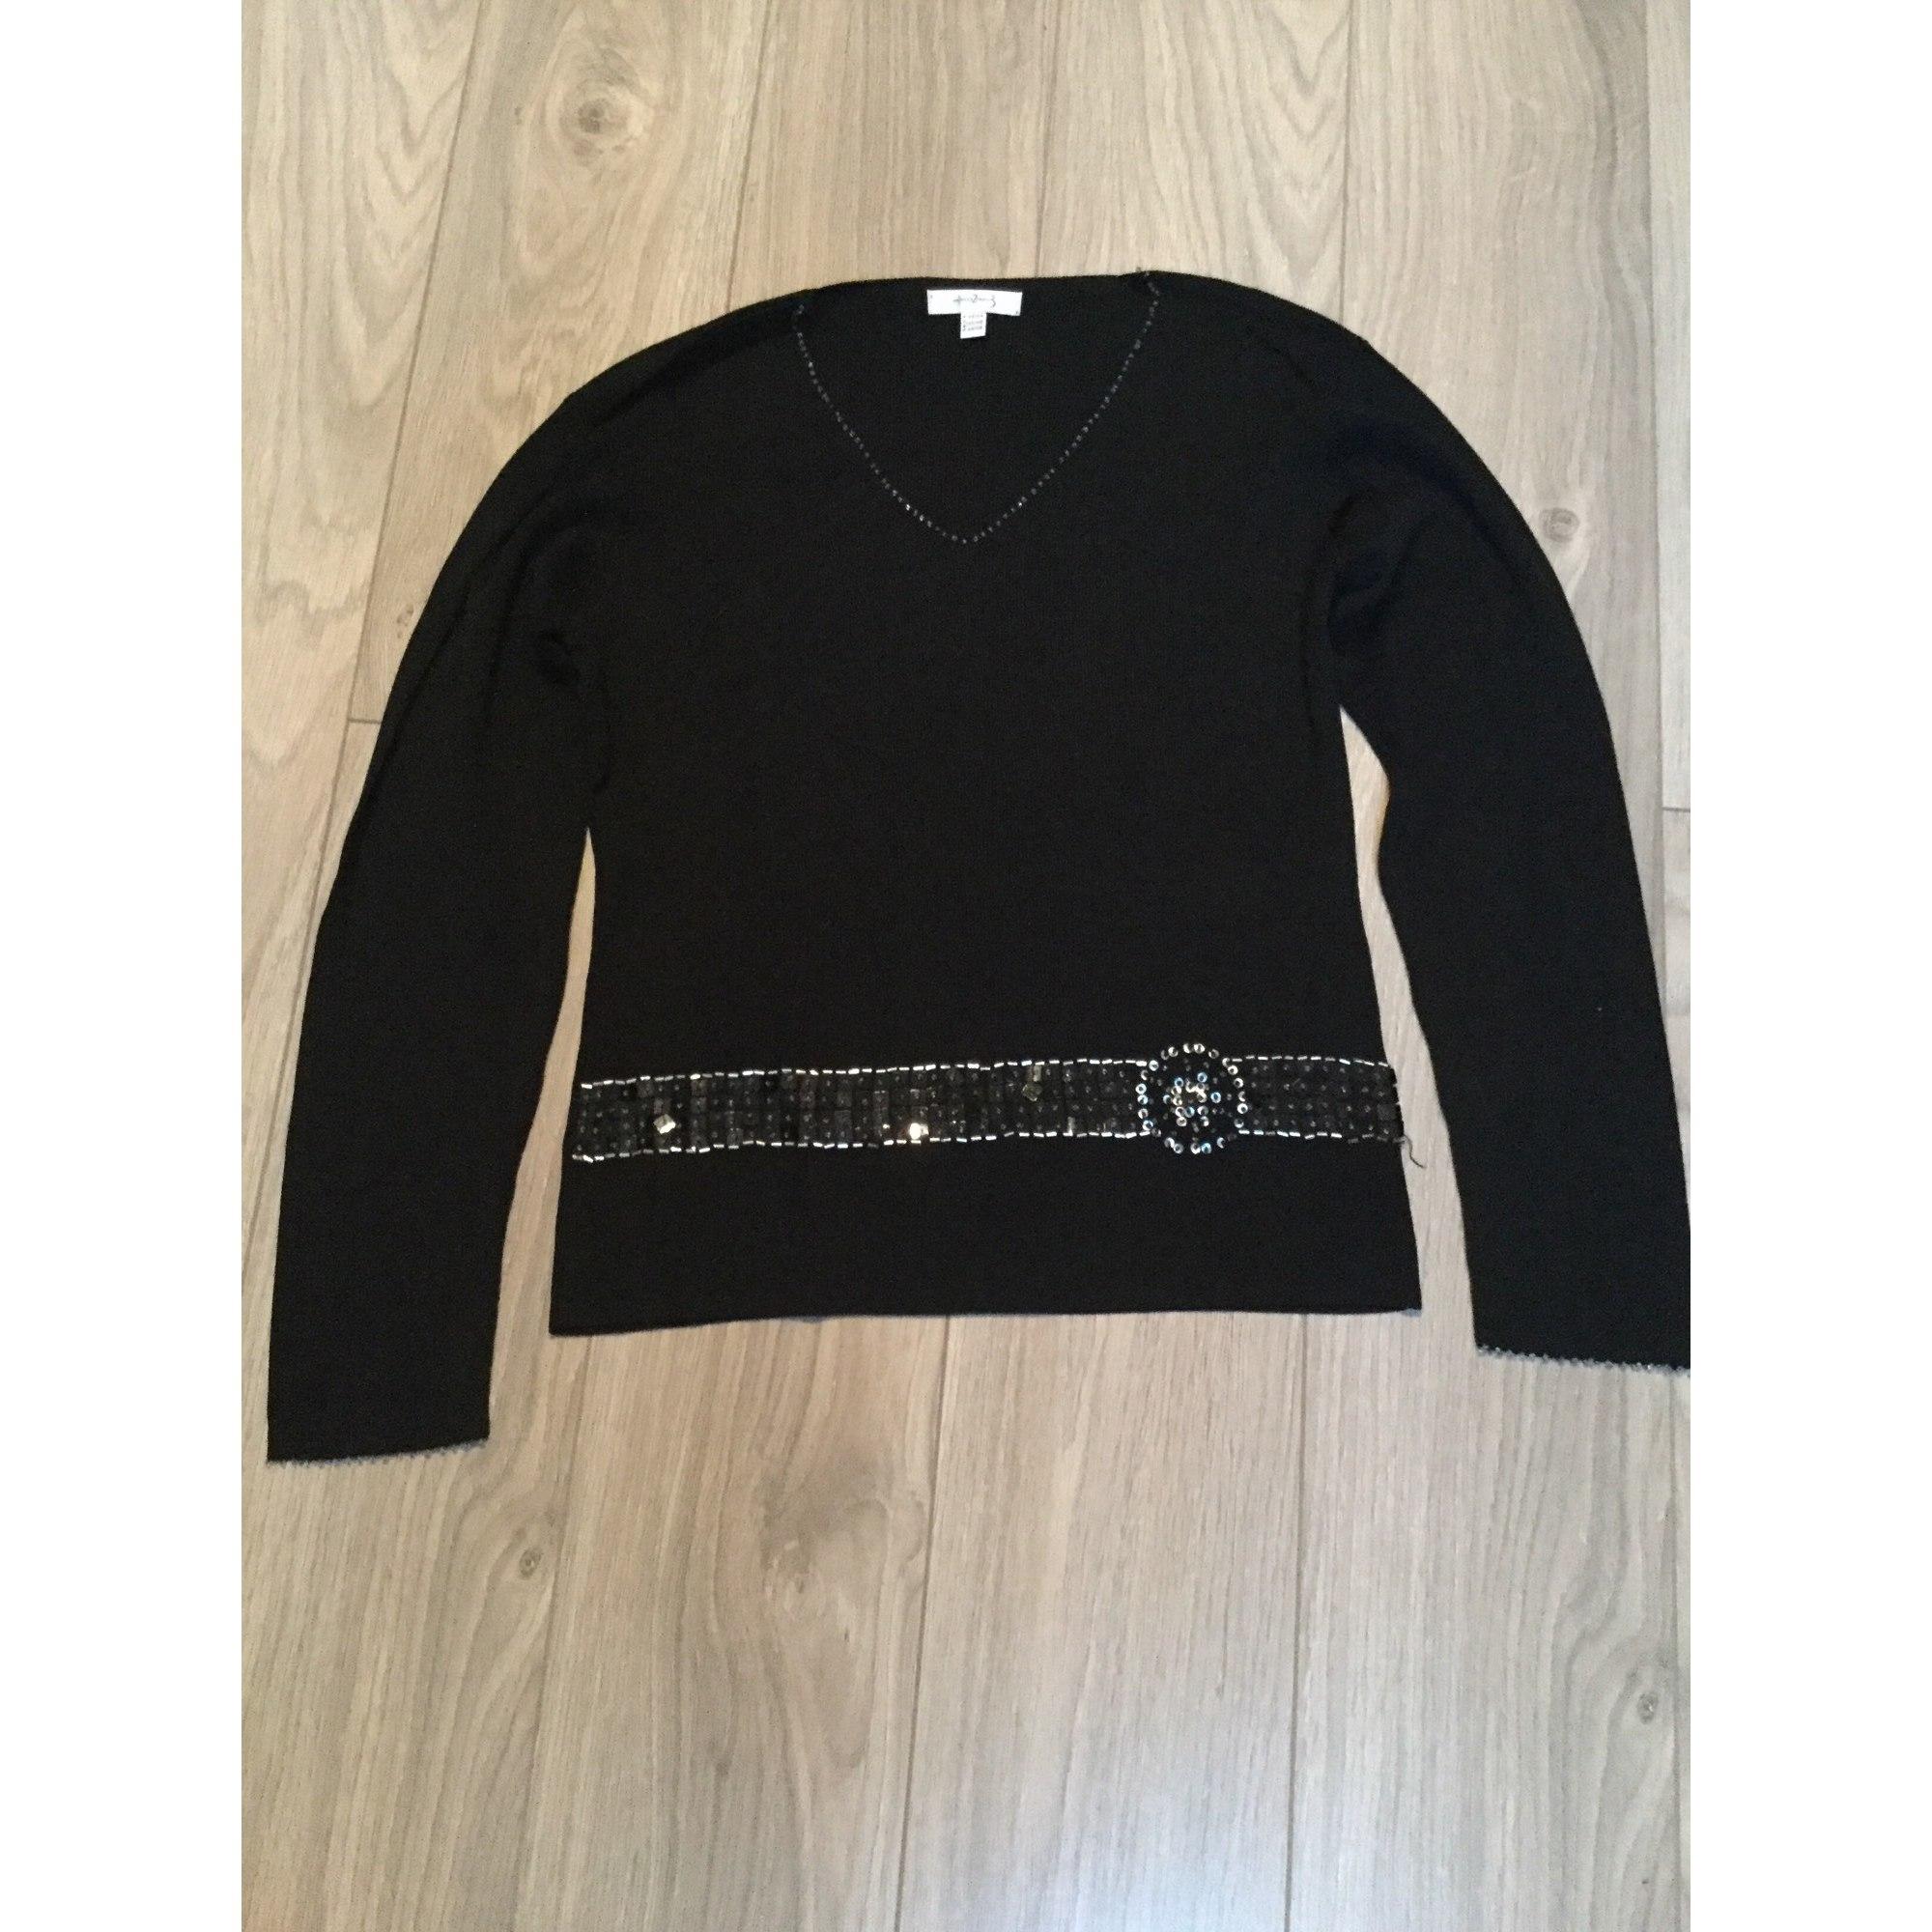 Pull tunique 1.2.3 Noir